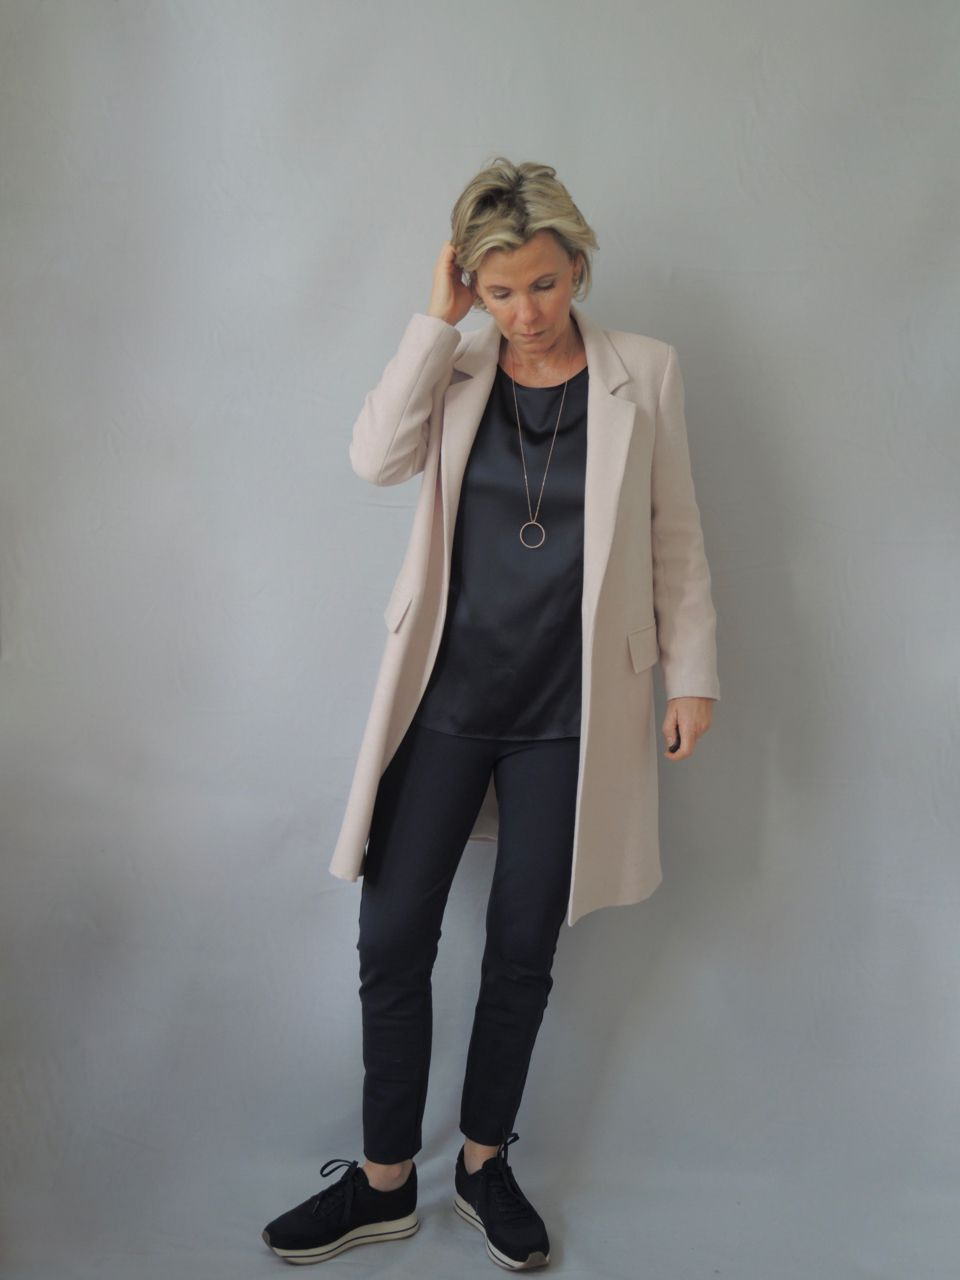 Pin Auf Women'S Fashion